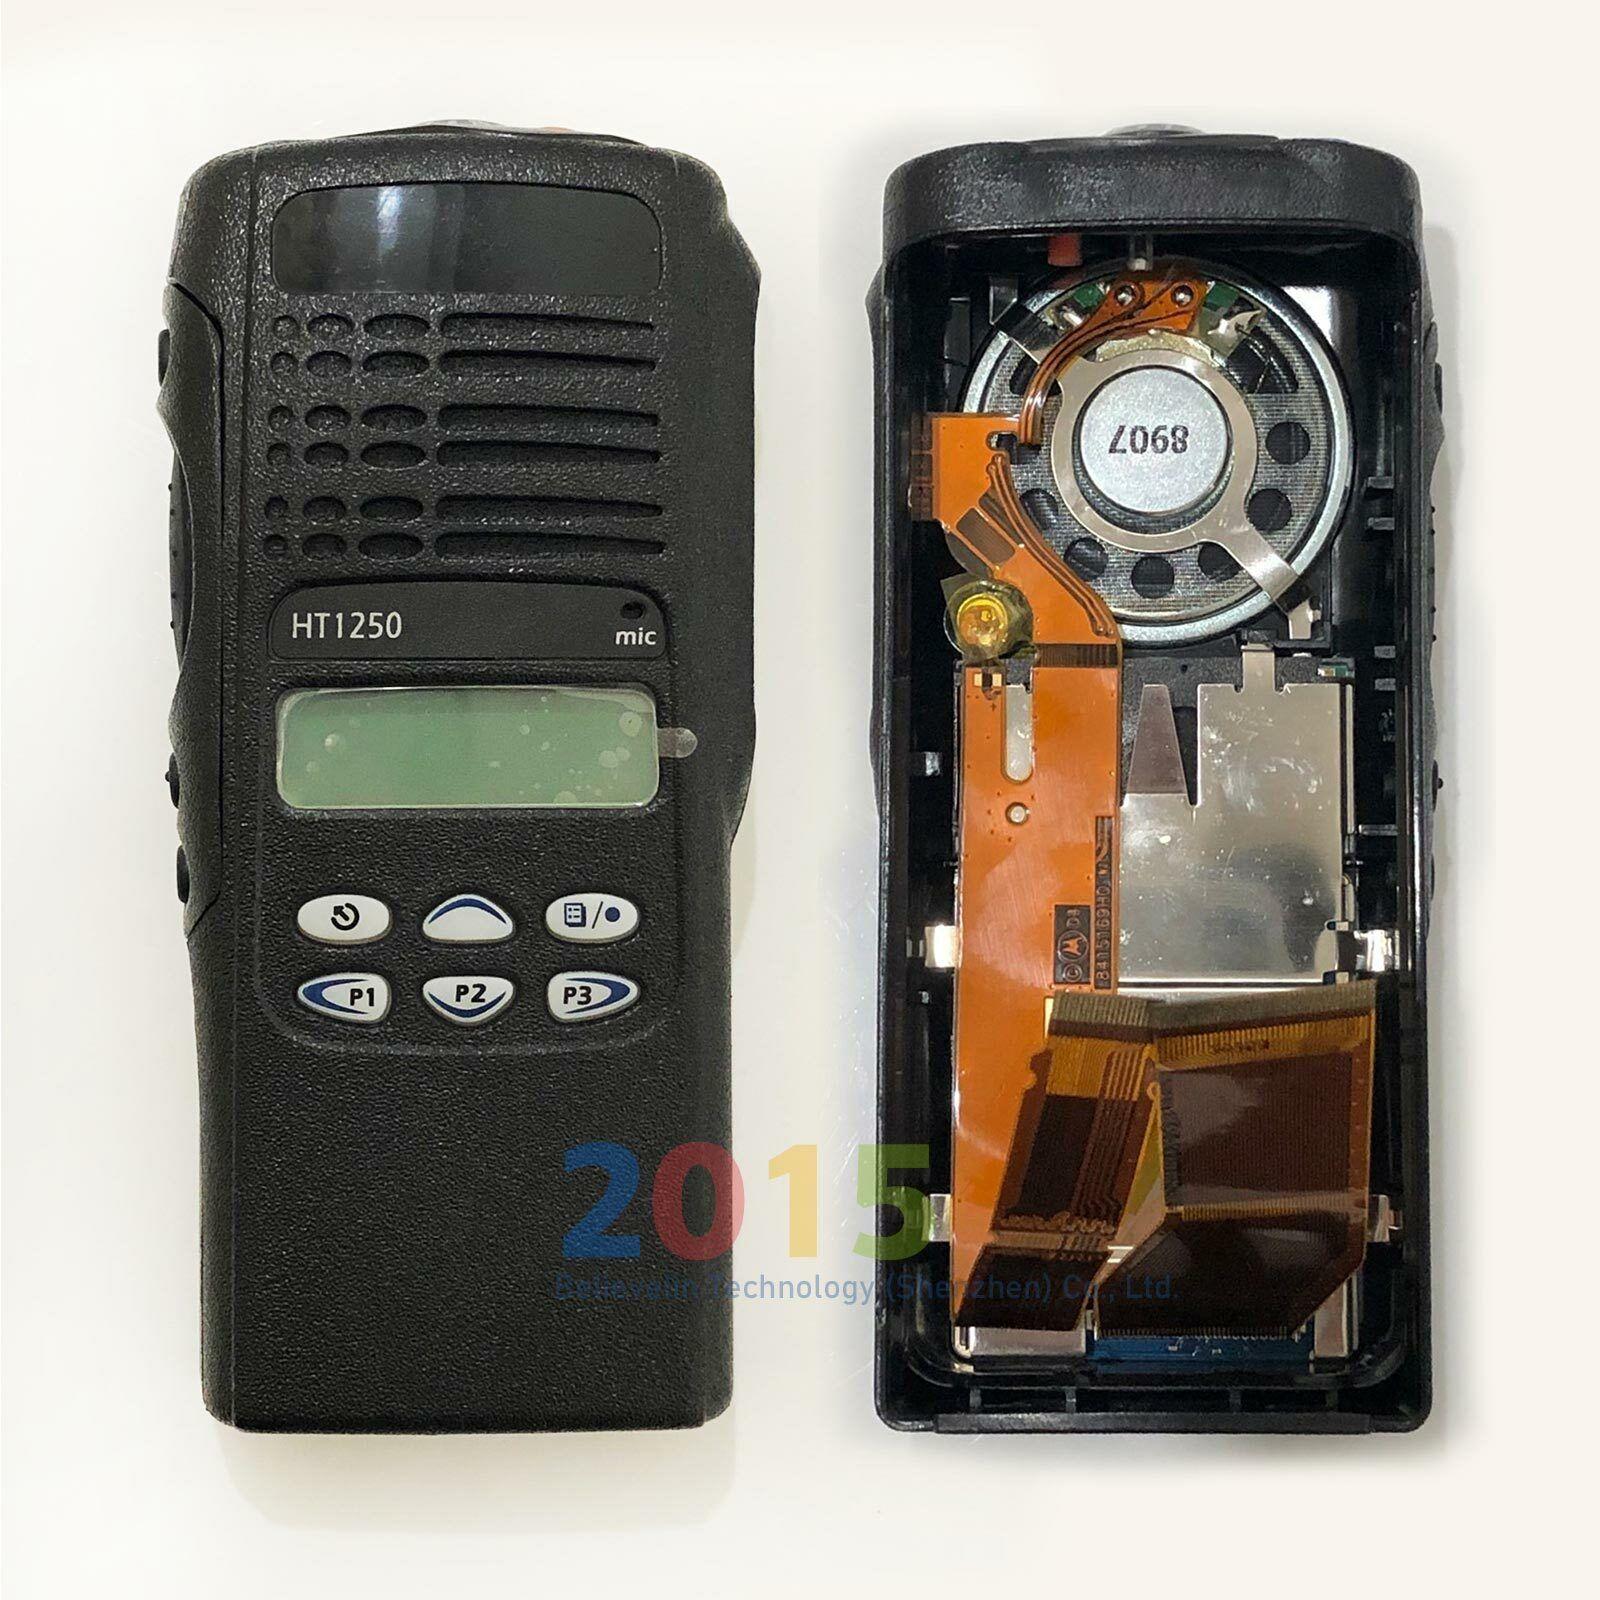 Titan® PMMN4021 Remote Speaker Mic for Motorola HT1250 HT750 New US STOCK